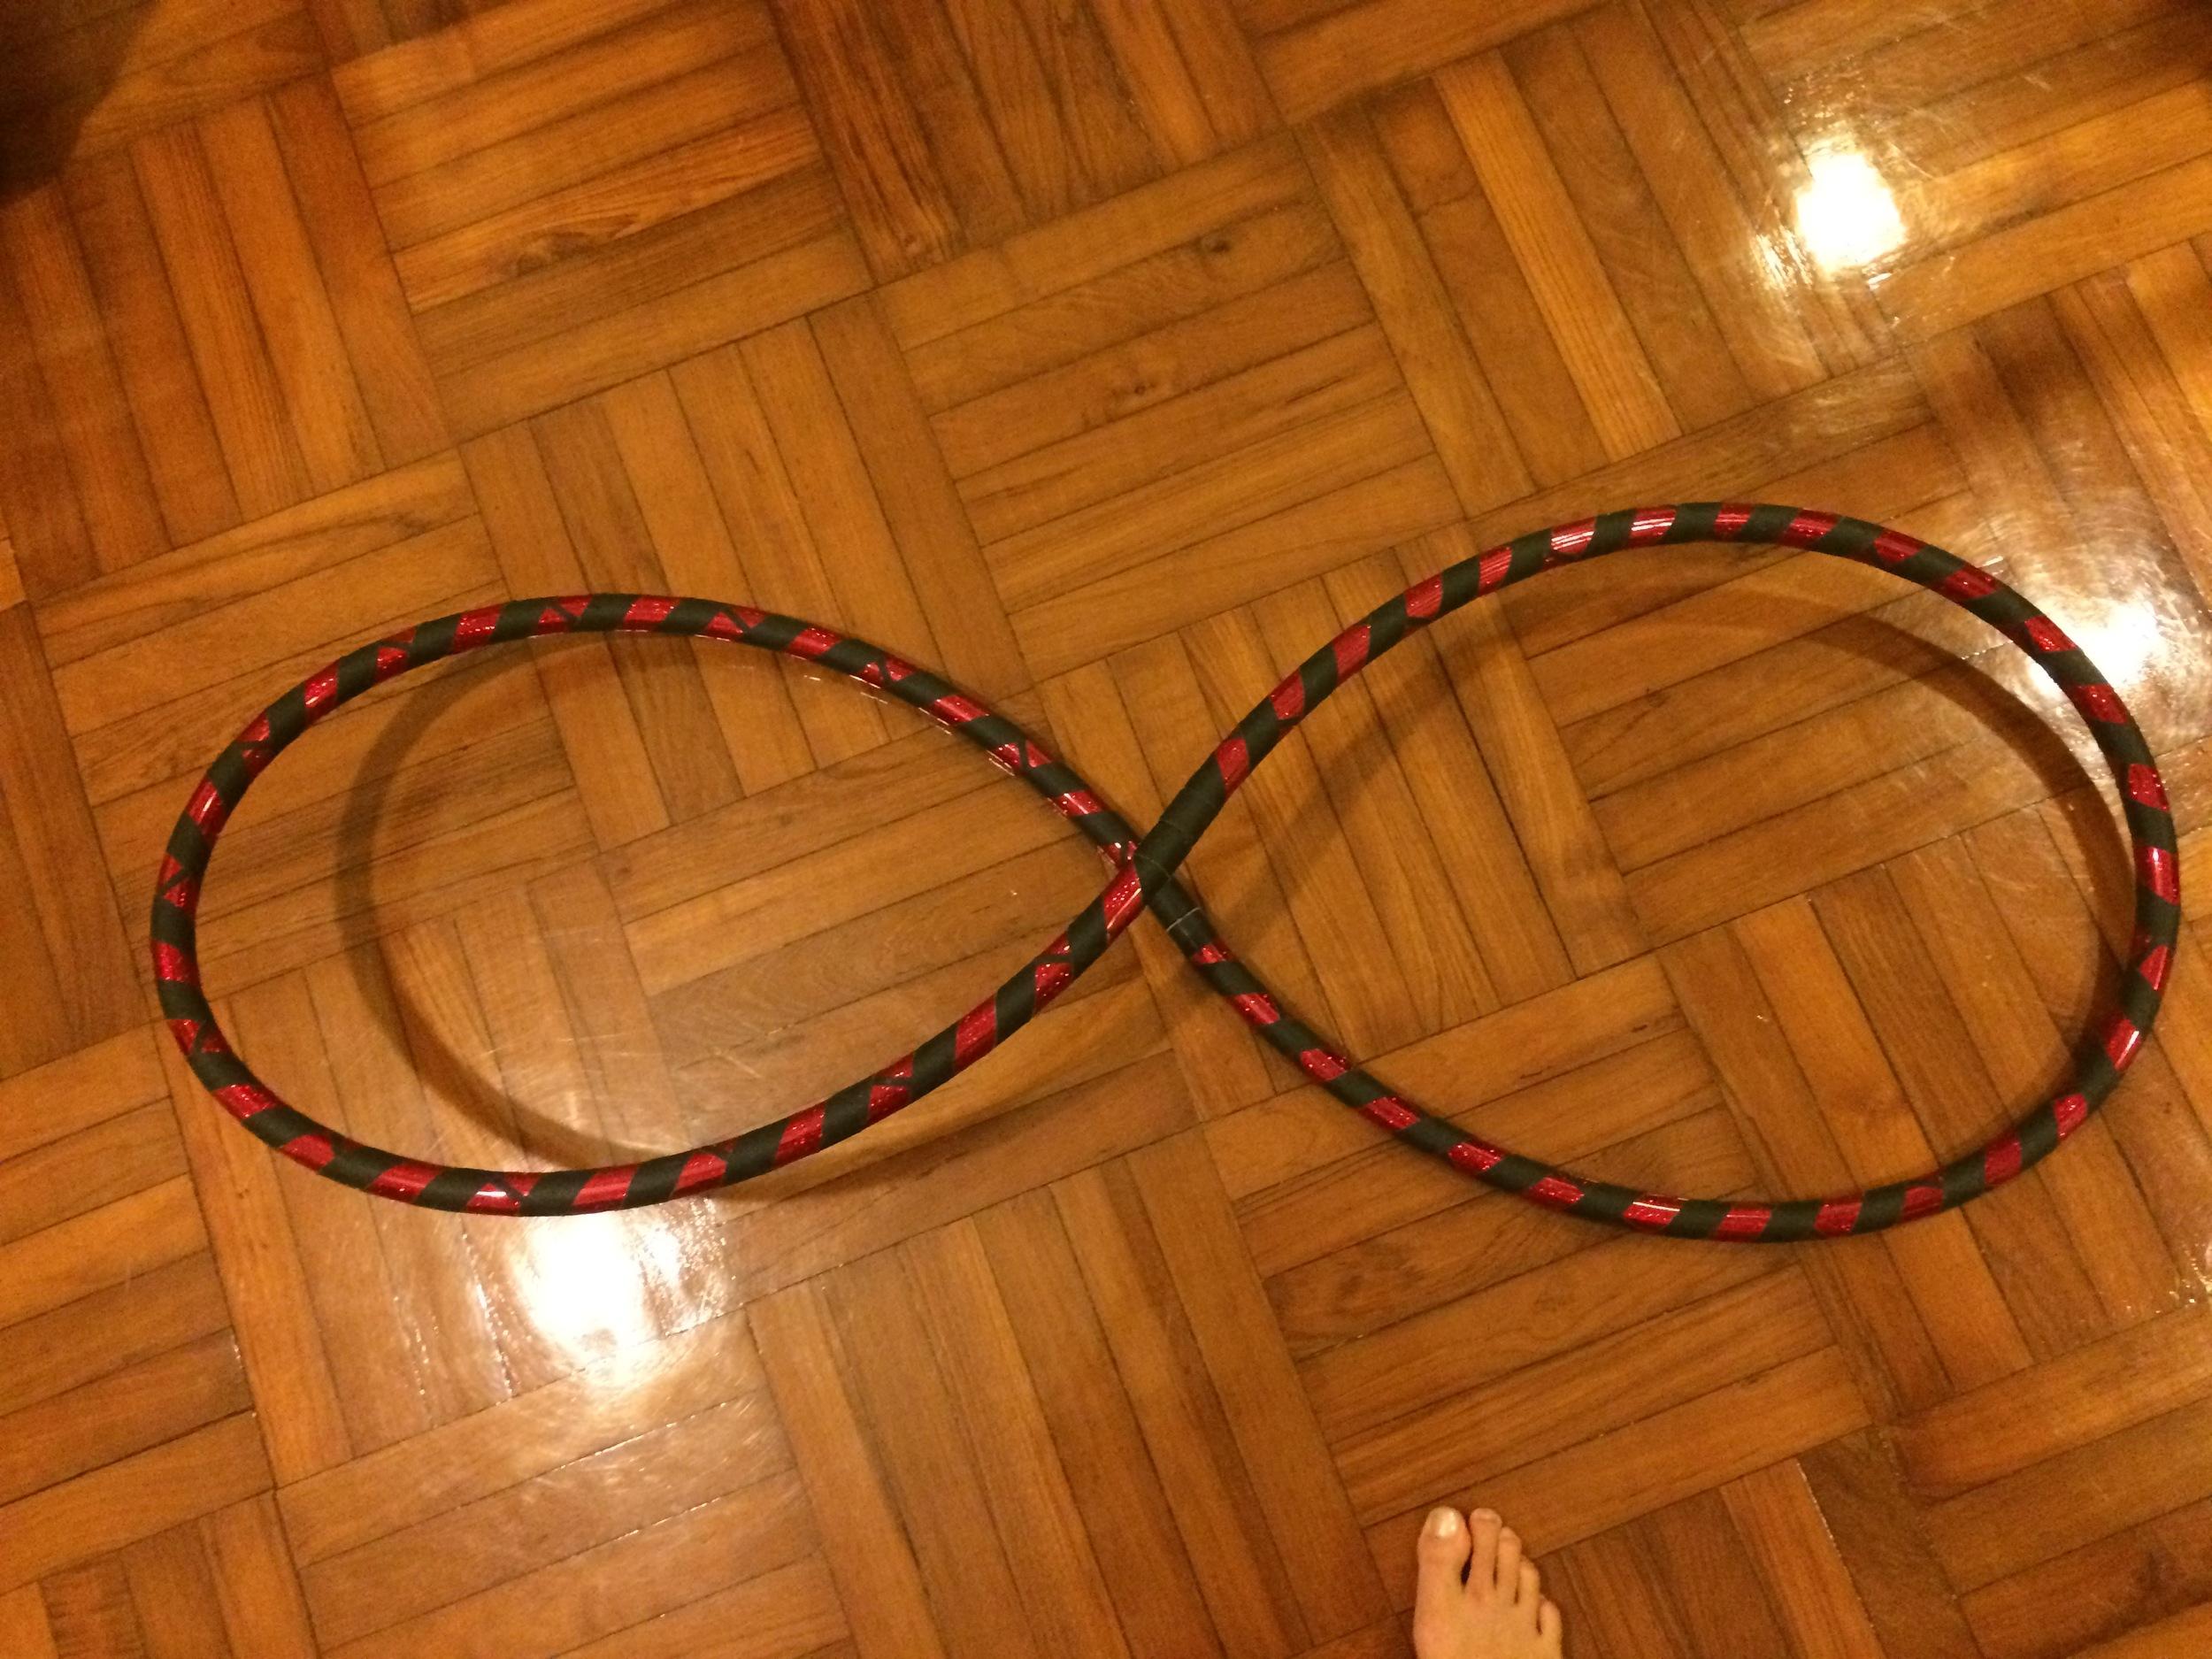 collapsible hula hoop hong kong 香港可接呼啦圈